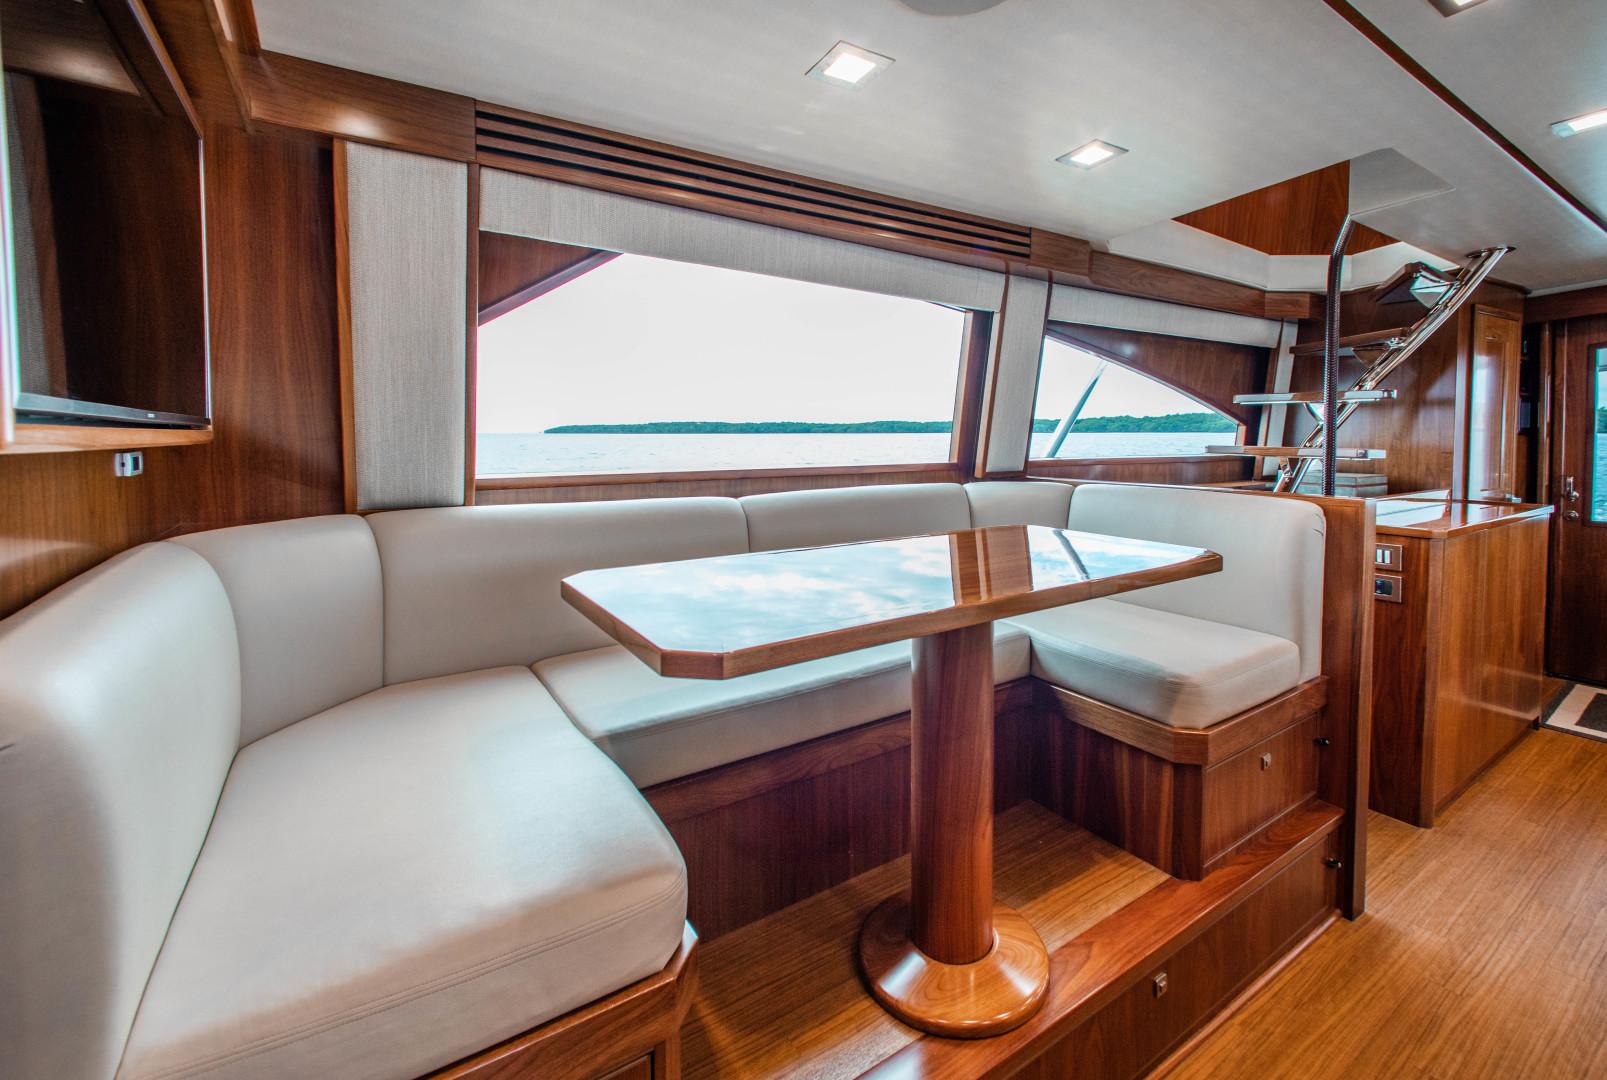 Viking-72 Enclosed Bridge 2018-Red Lion Ocean Reef-Florida-United States-2018 Viking 72 Enclosed Bridge  Red Lion  Dinette-1568237   Thumbnail